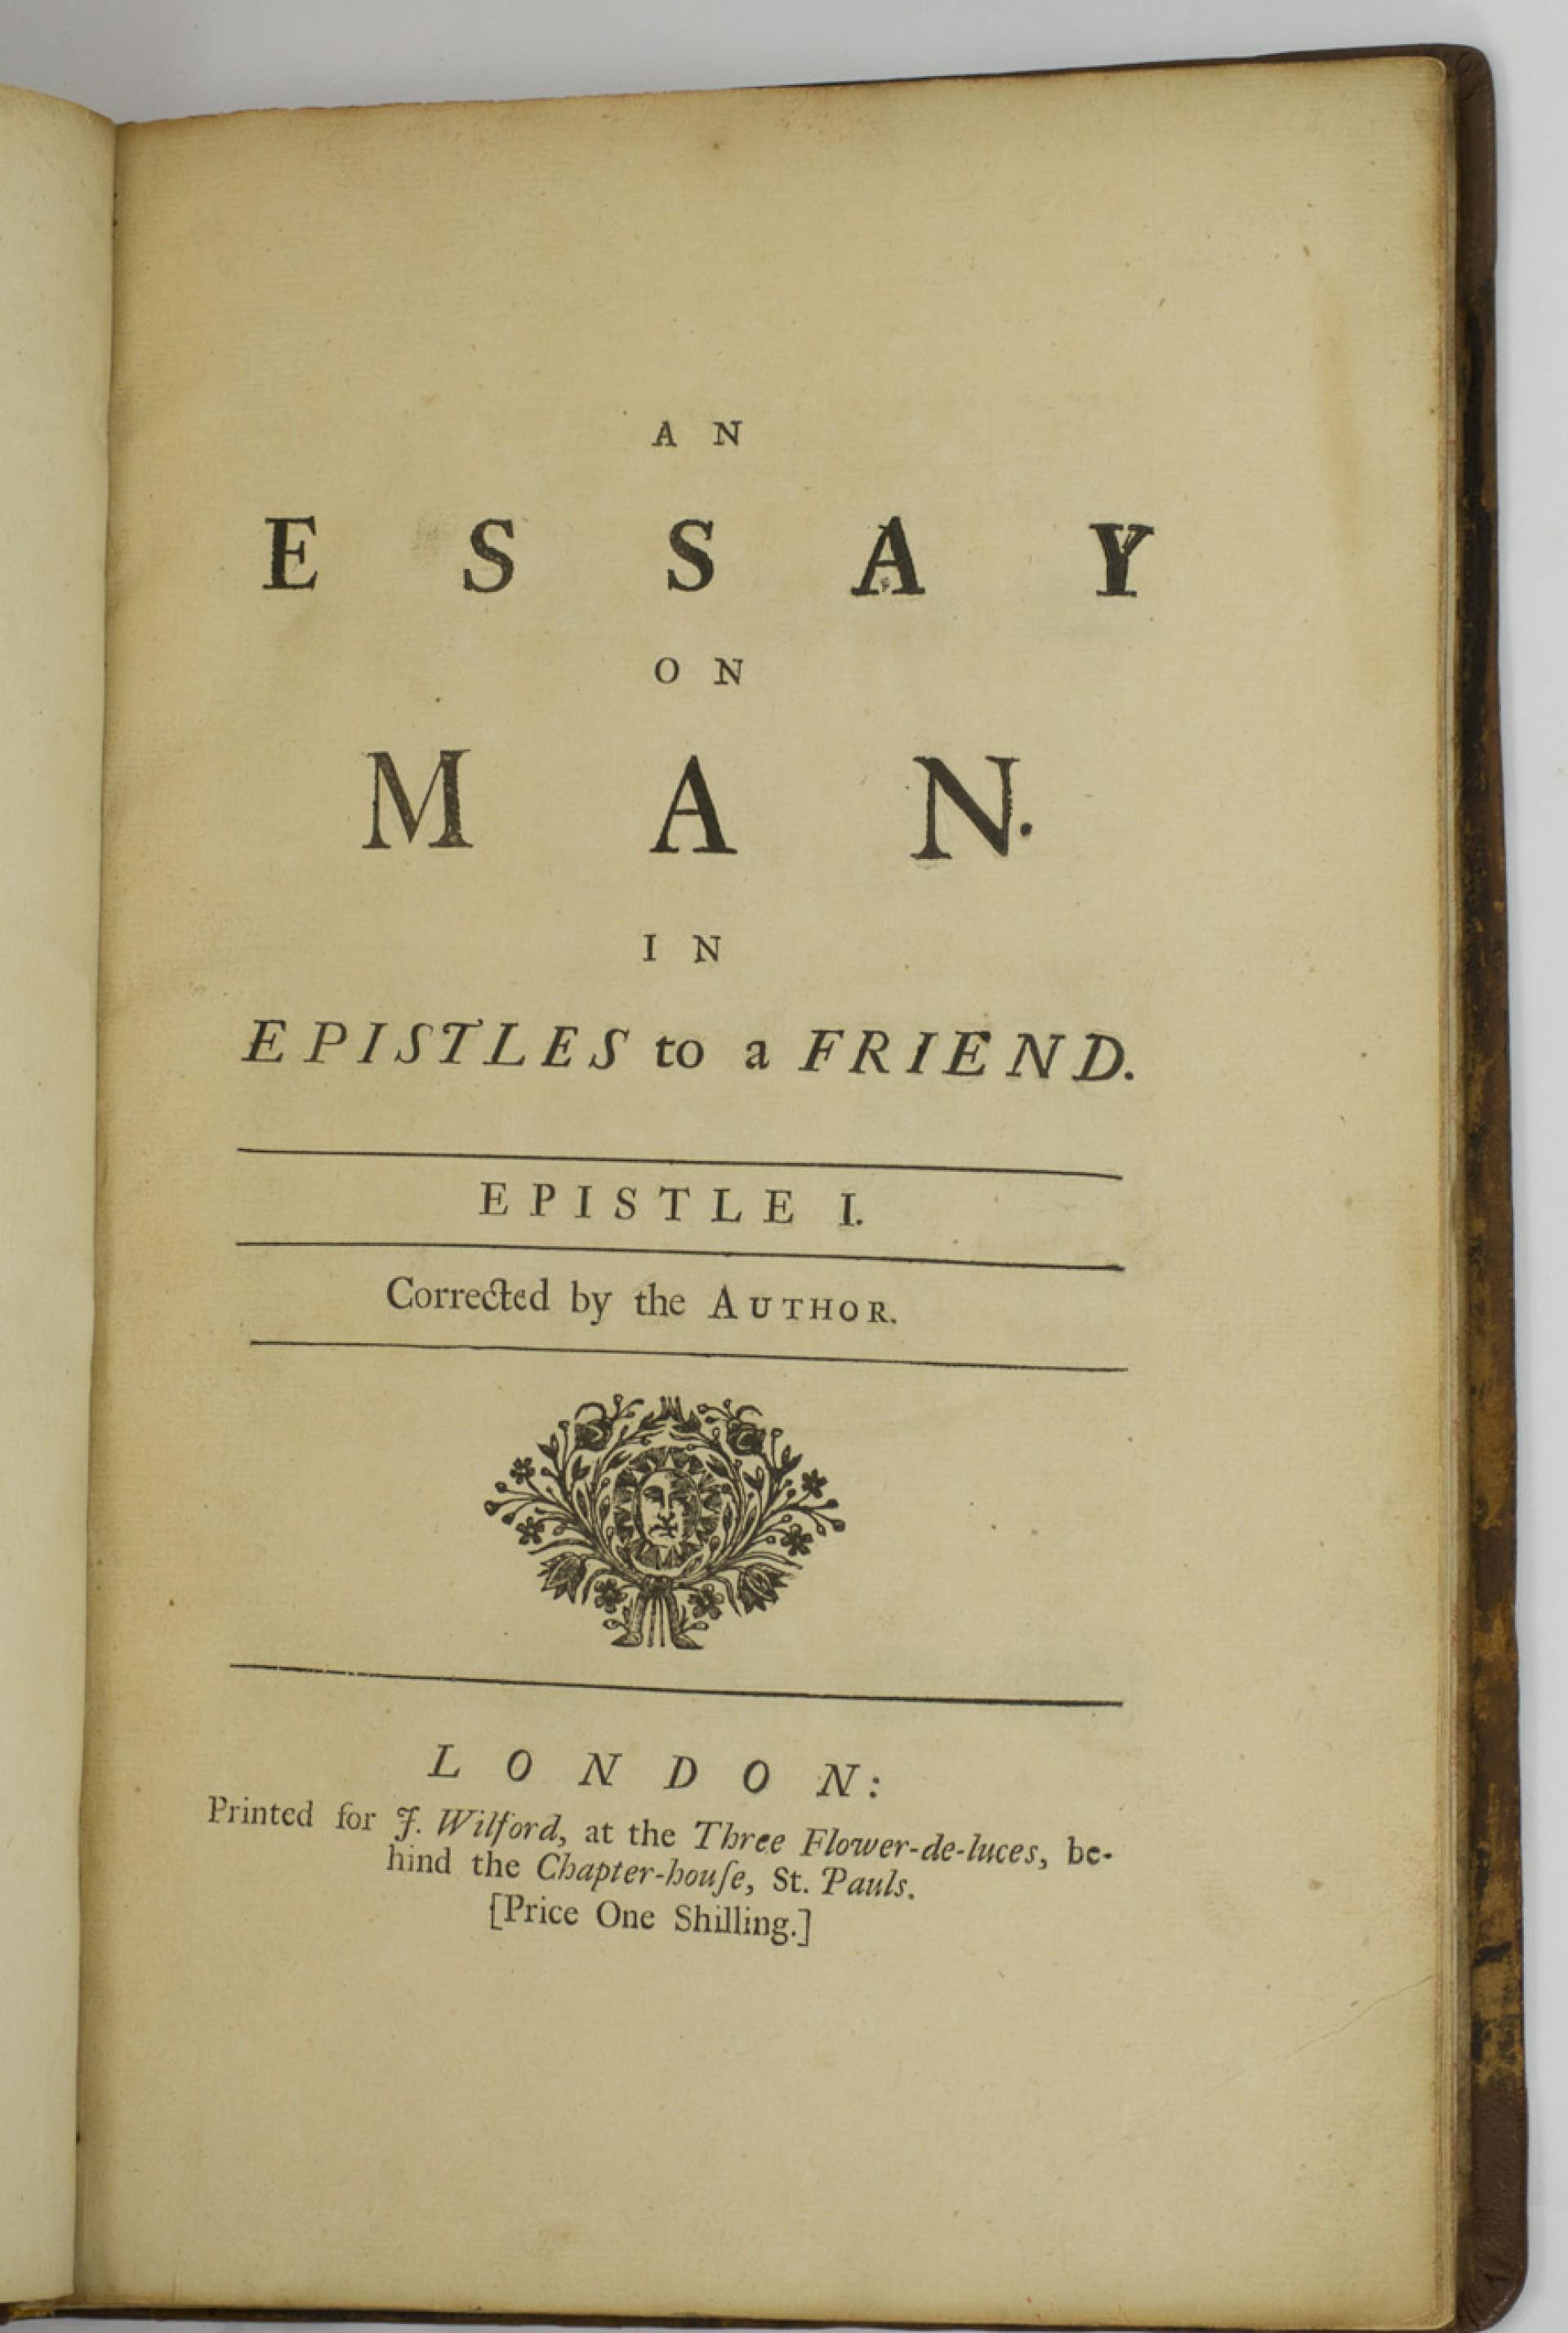 002 Alexander Pope Essay On Man Example 65395 3 Dreaded Summary Epistle 2 Pdf 1920